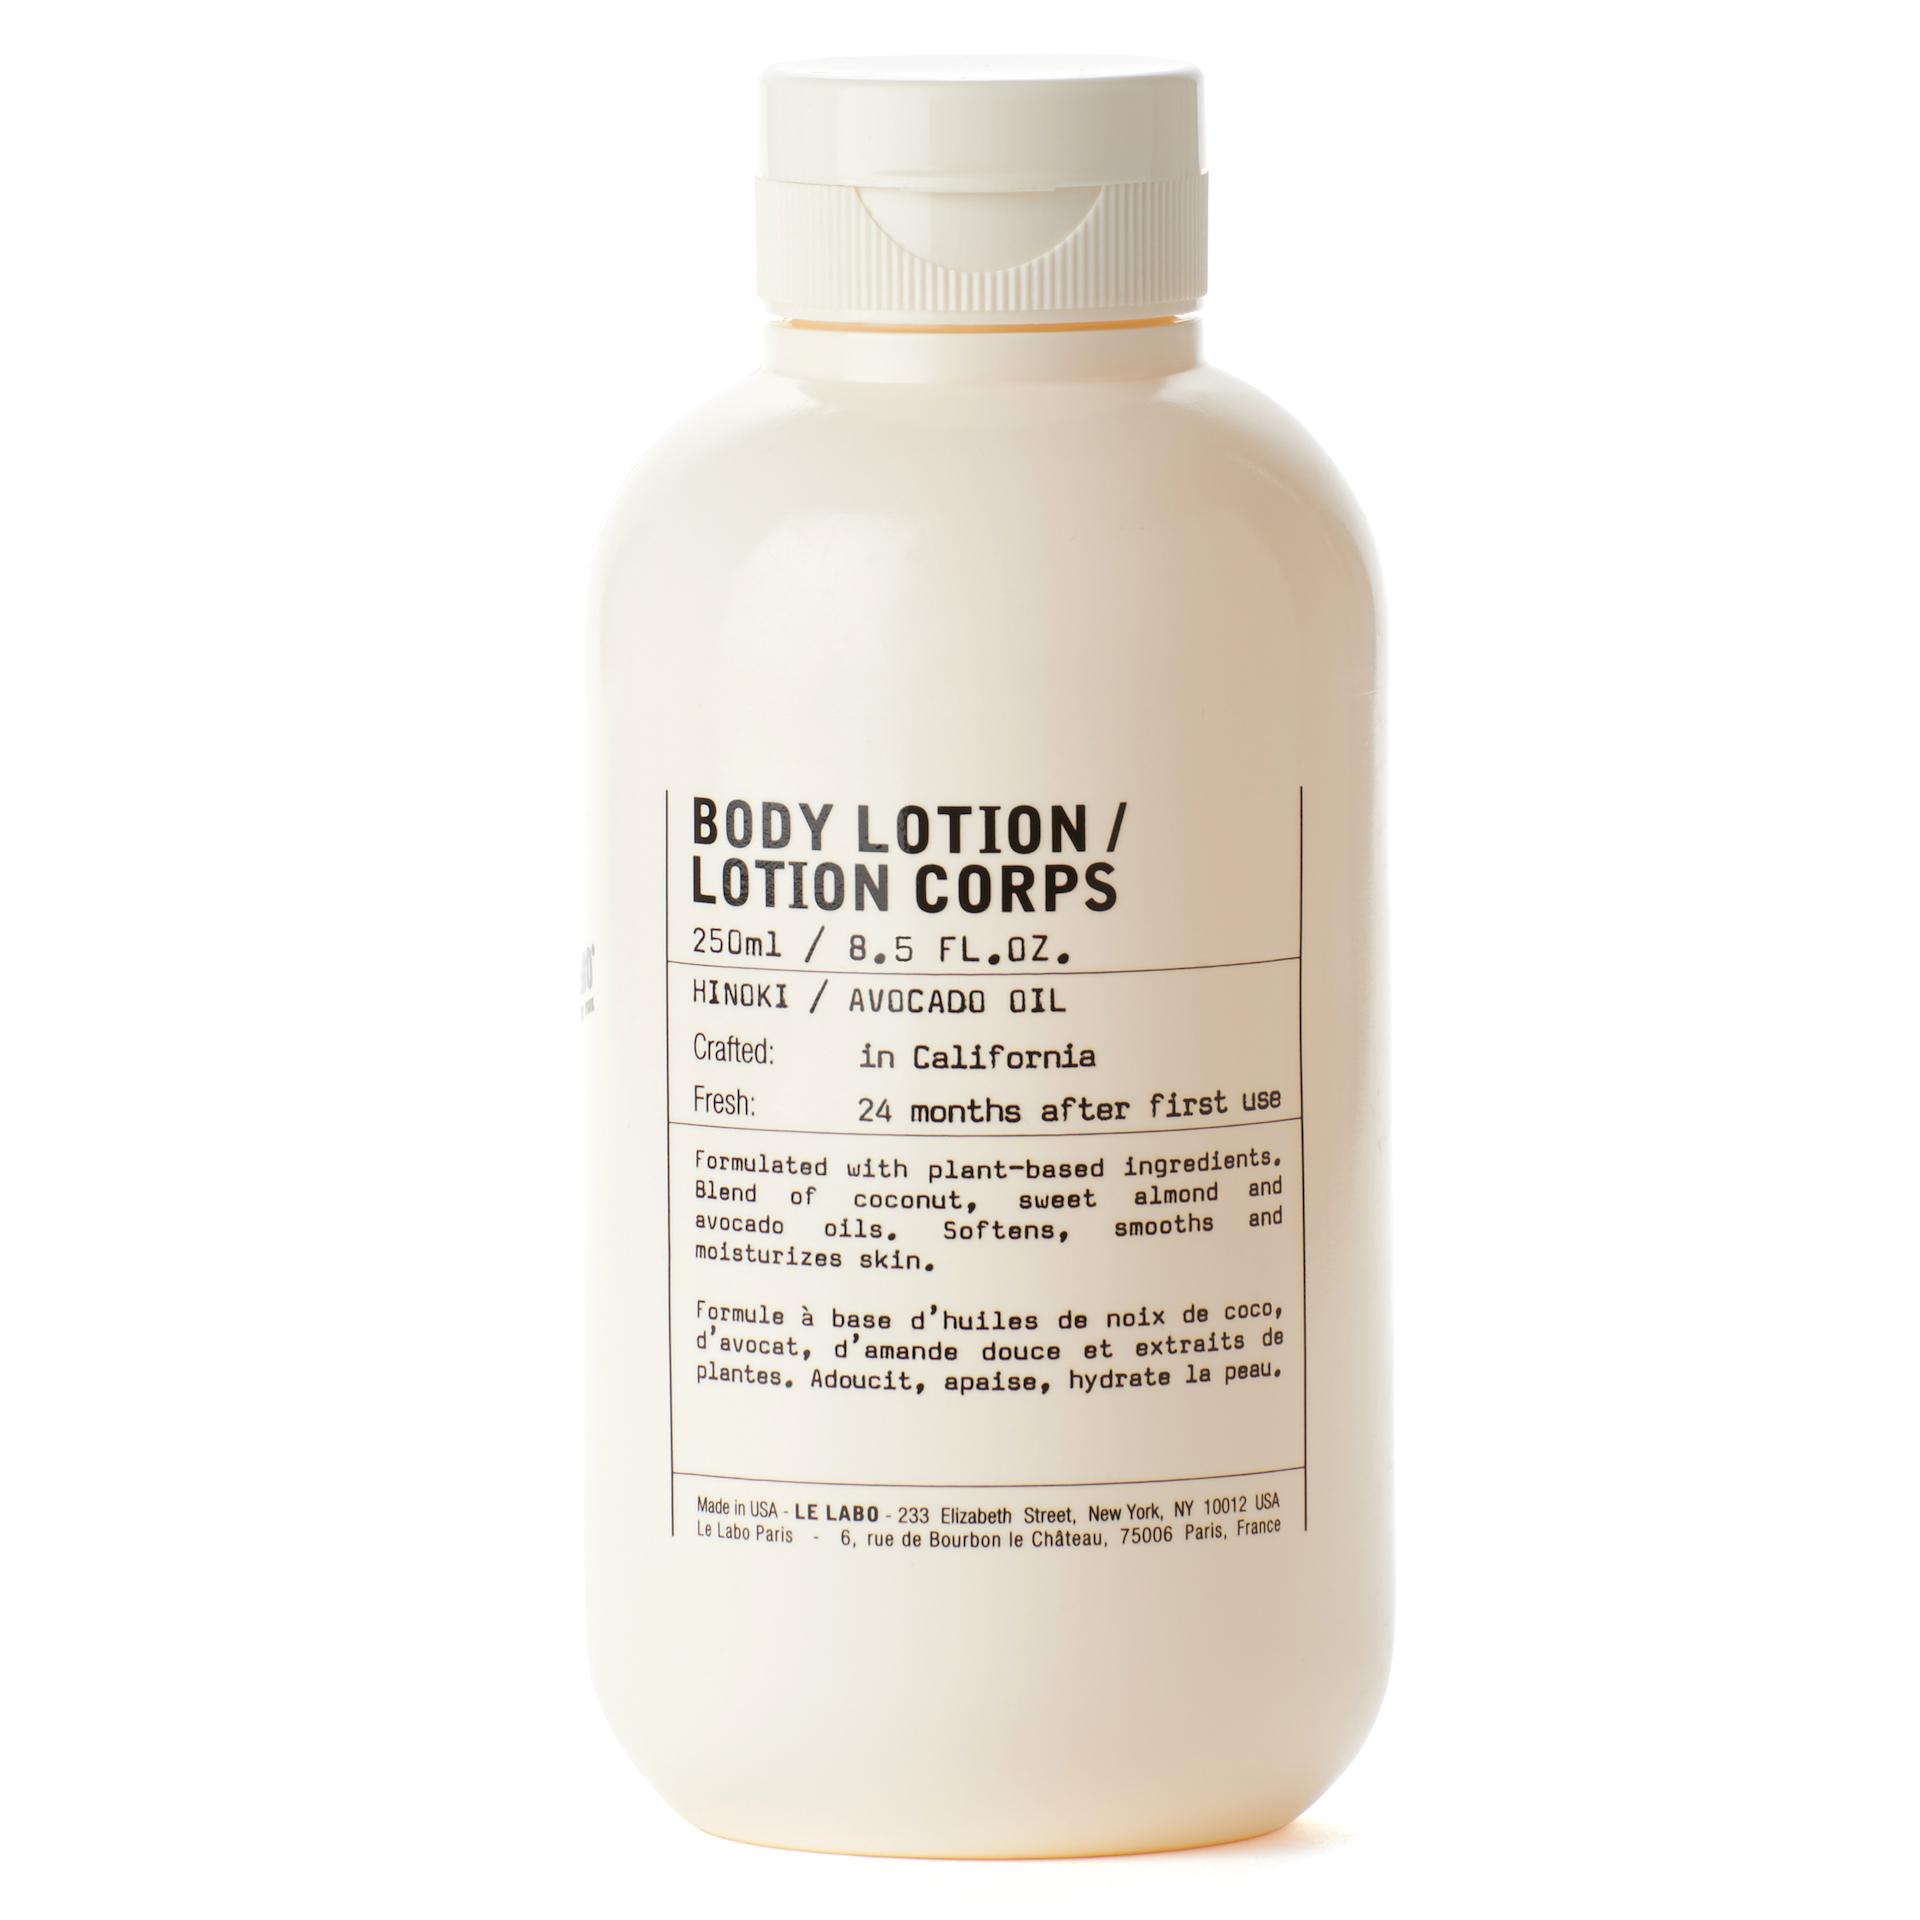 Body lotion 250ml